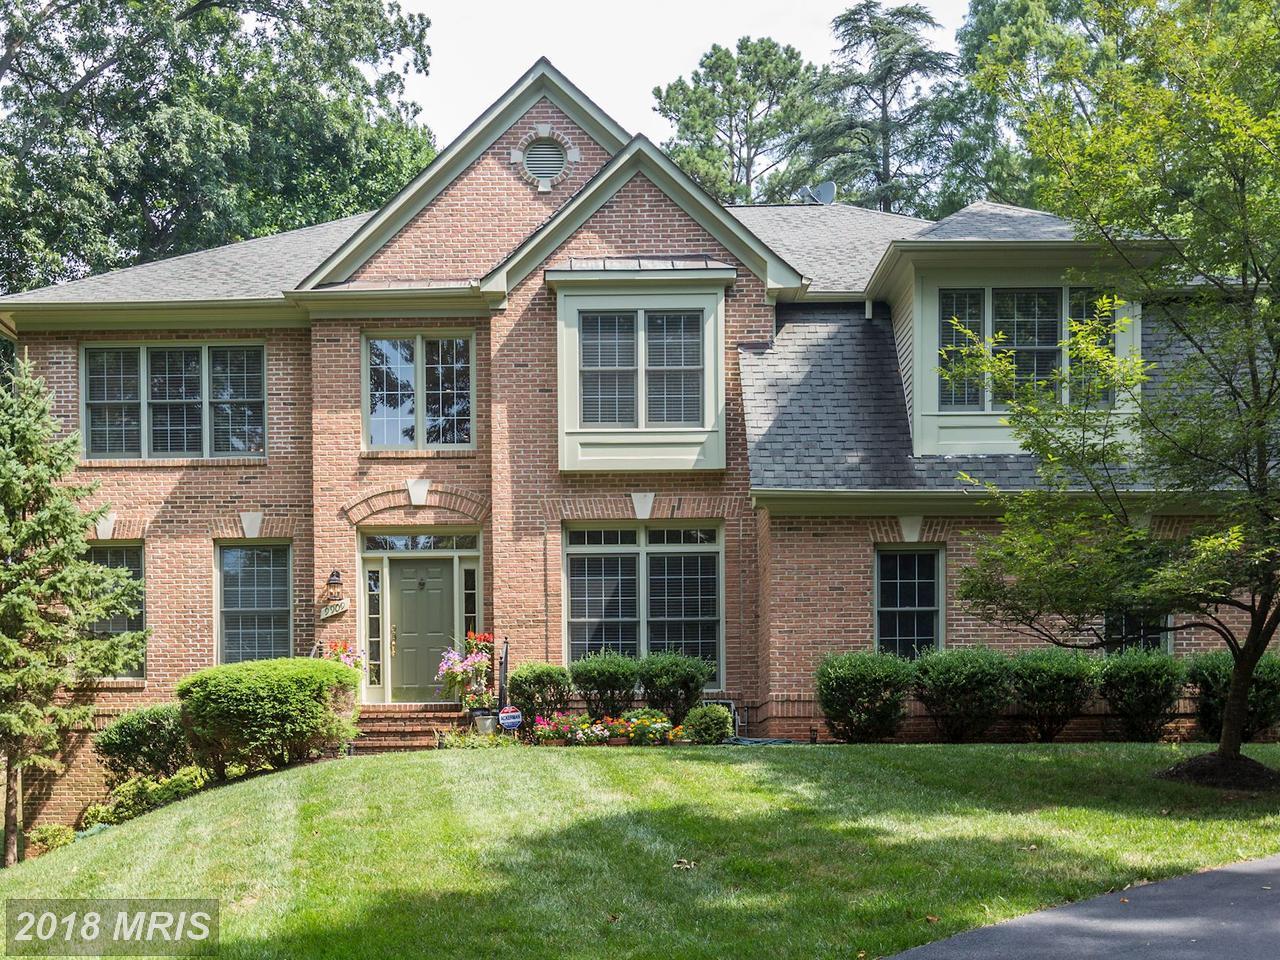 Single Family Home for Sale at Colonial, Detached - ROCKVILLE, MD 9909 ALDERSGATE RD Rockville, Maryland,20850 United States